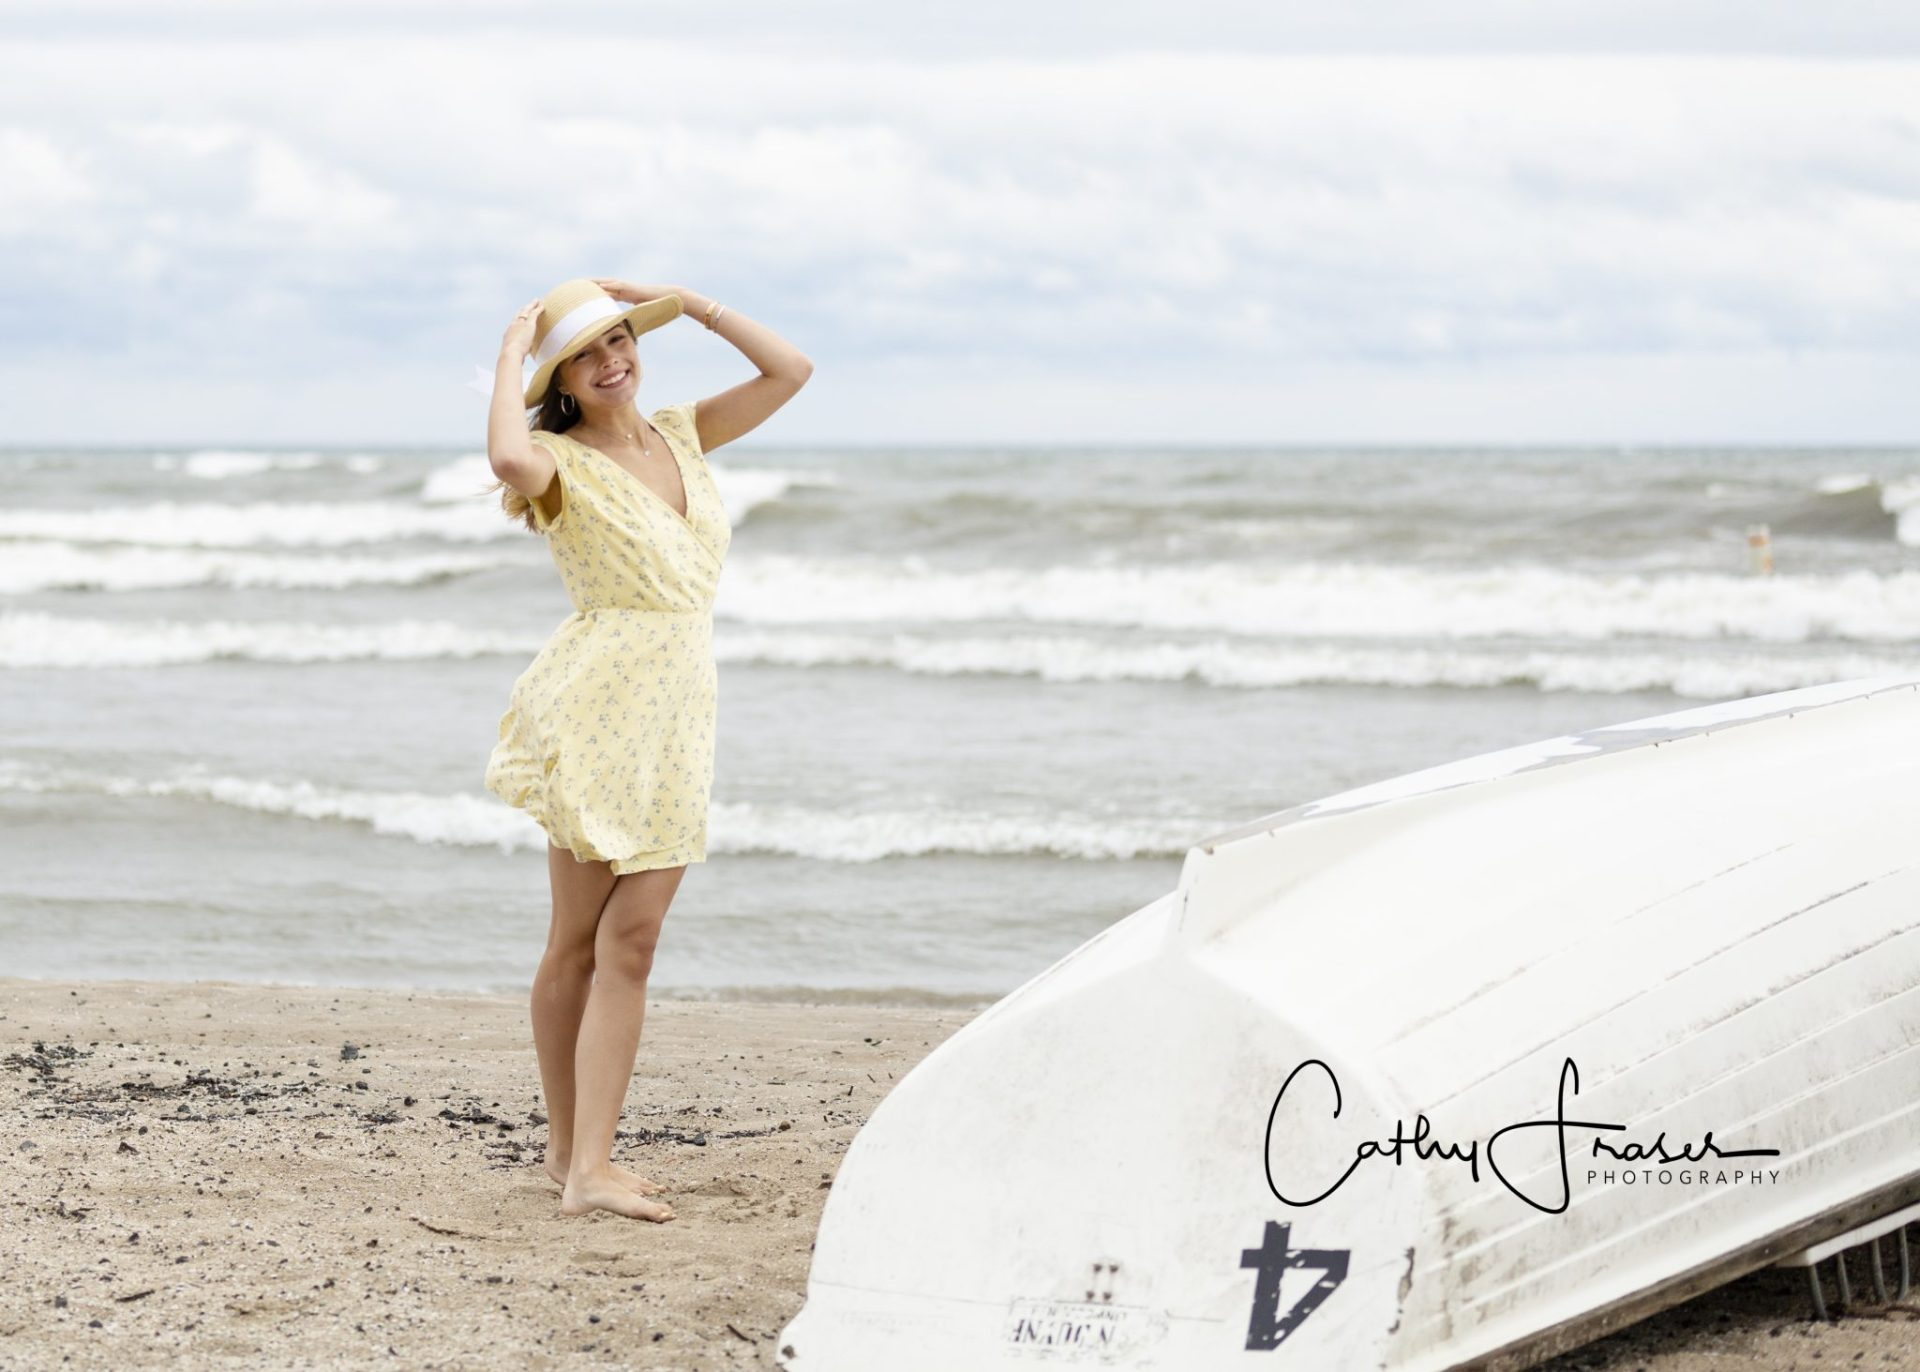 ellow dress, floppy hat, Rochester, New York, Charlotte Pier, Charlotte Beach, Great Lakes, life boat